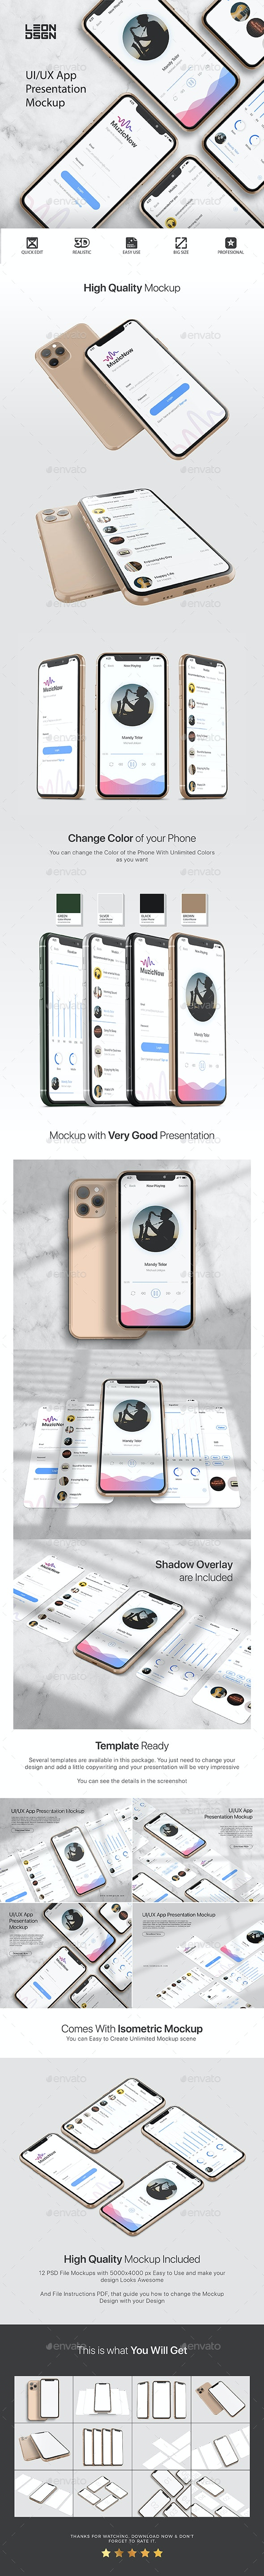 UI/UX App Presentation Mockup - Phone 11 - Mobile Displays